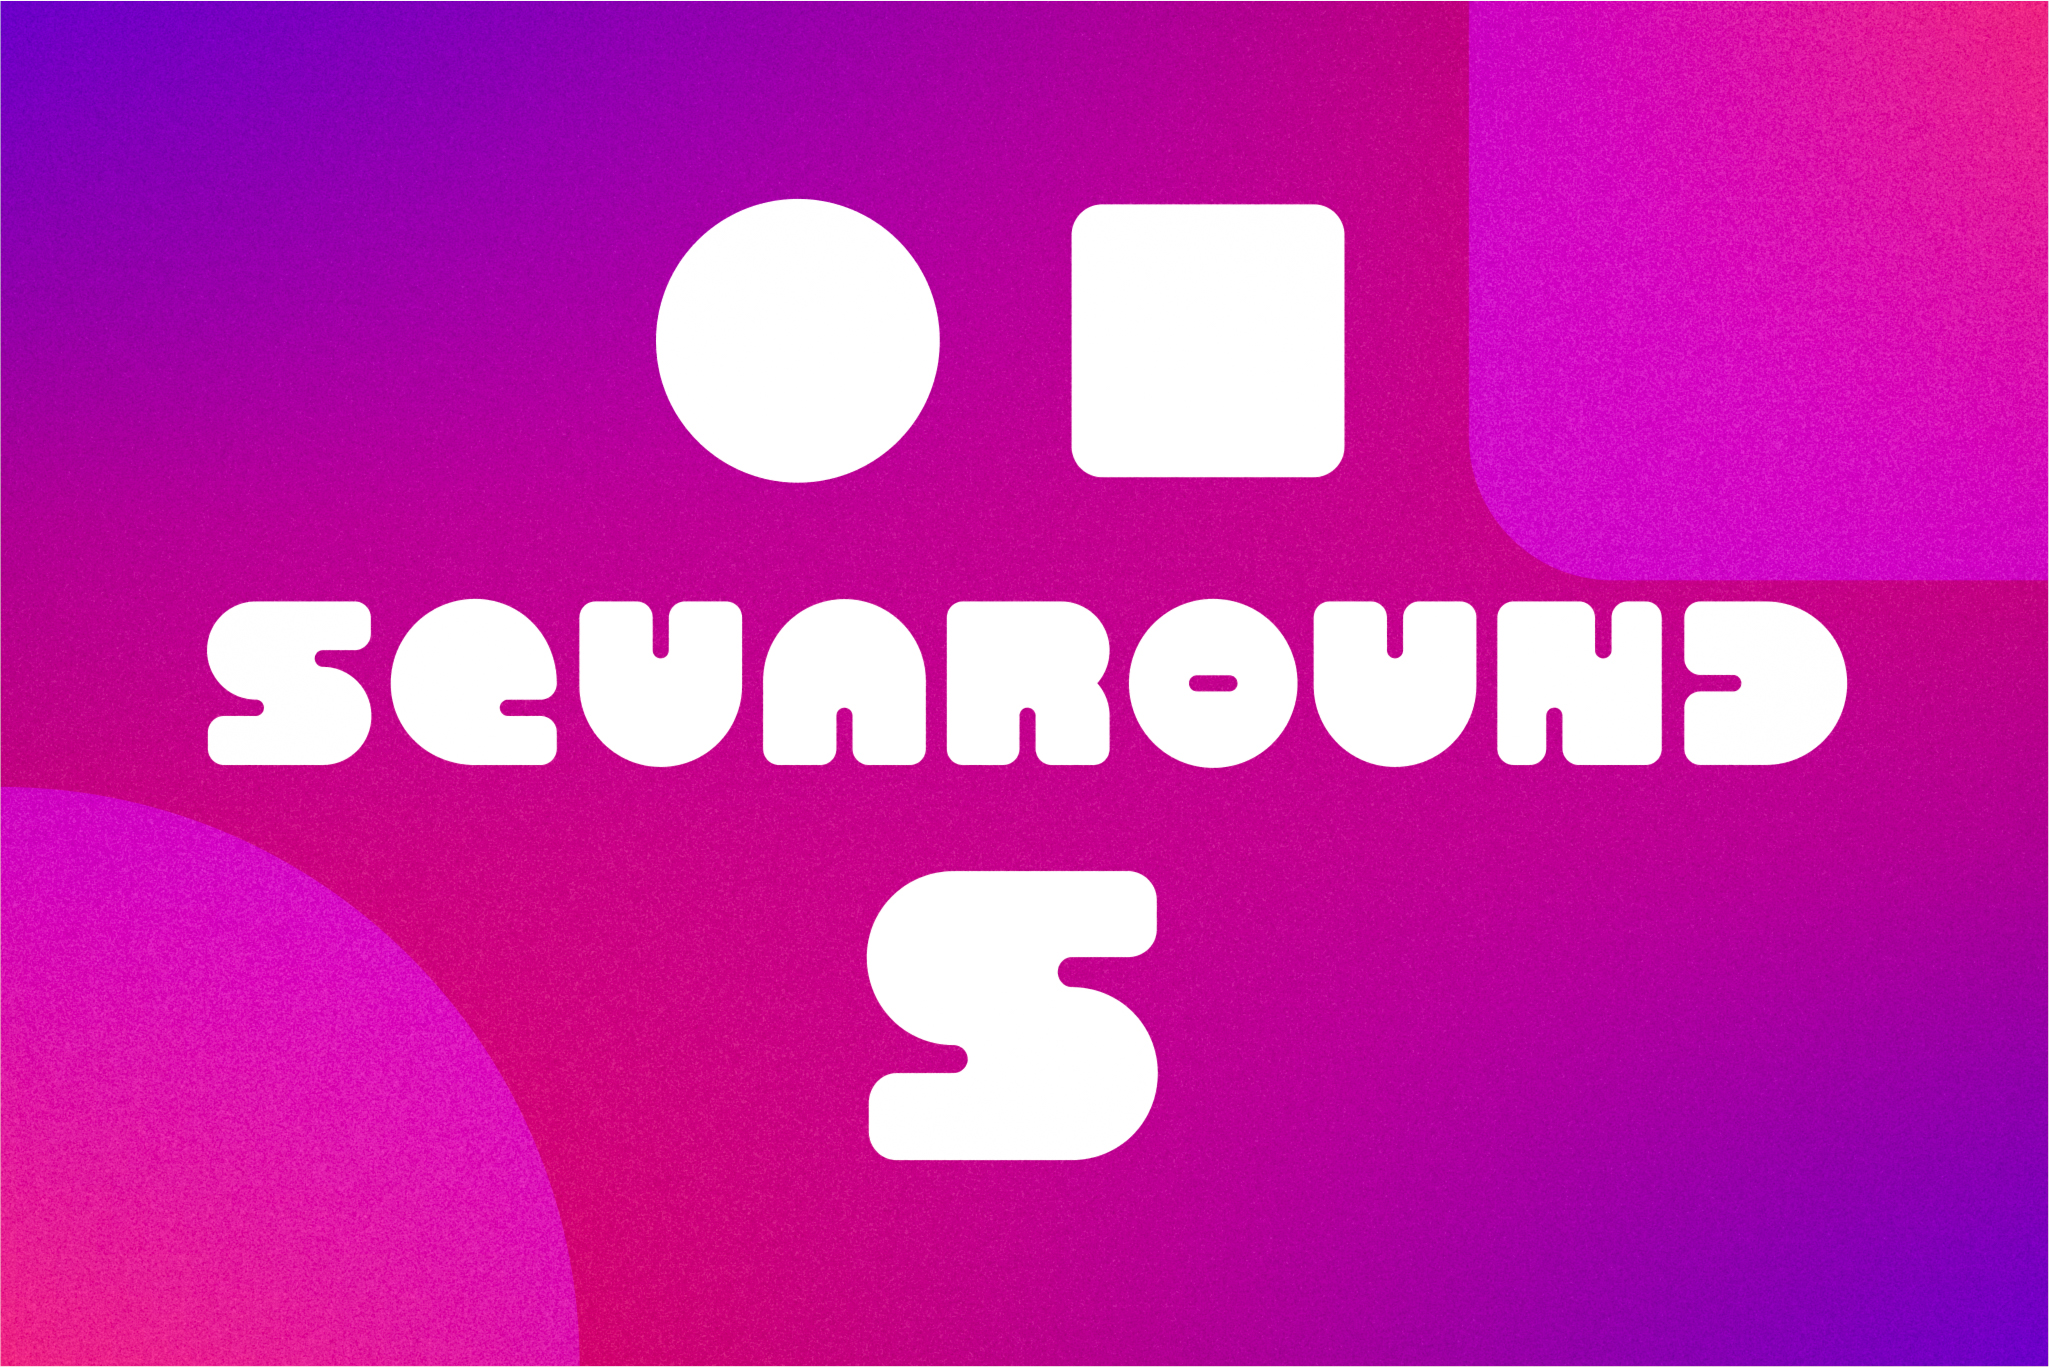 SQUAROUND S example image 1